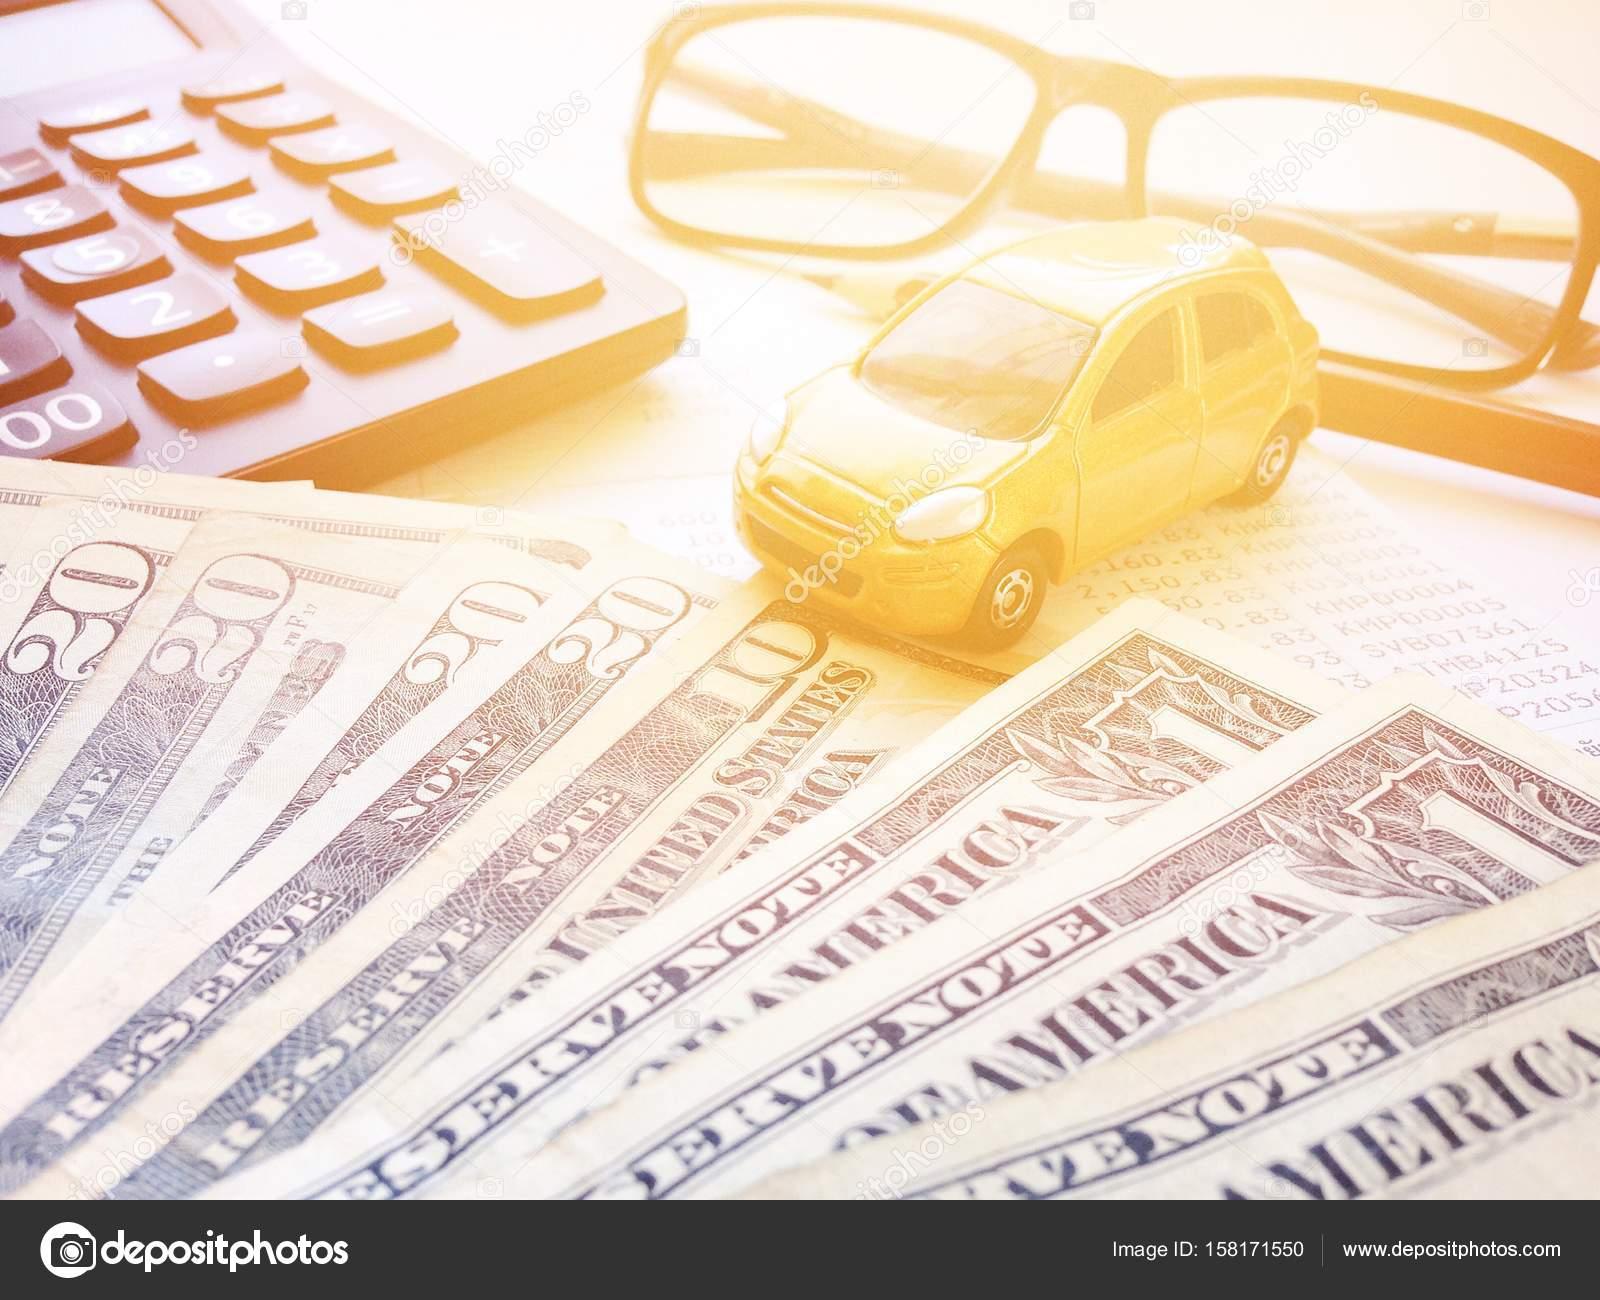 Business, Finance, Savings, Banking Or Car Loan Concept : Miniature Car  Model, Pencil, Calculator, Eyeglasses, Money And Savings Account Passbook  Or ...